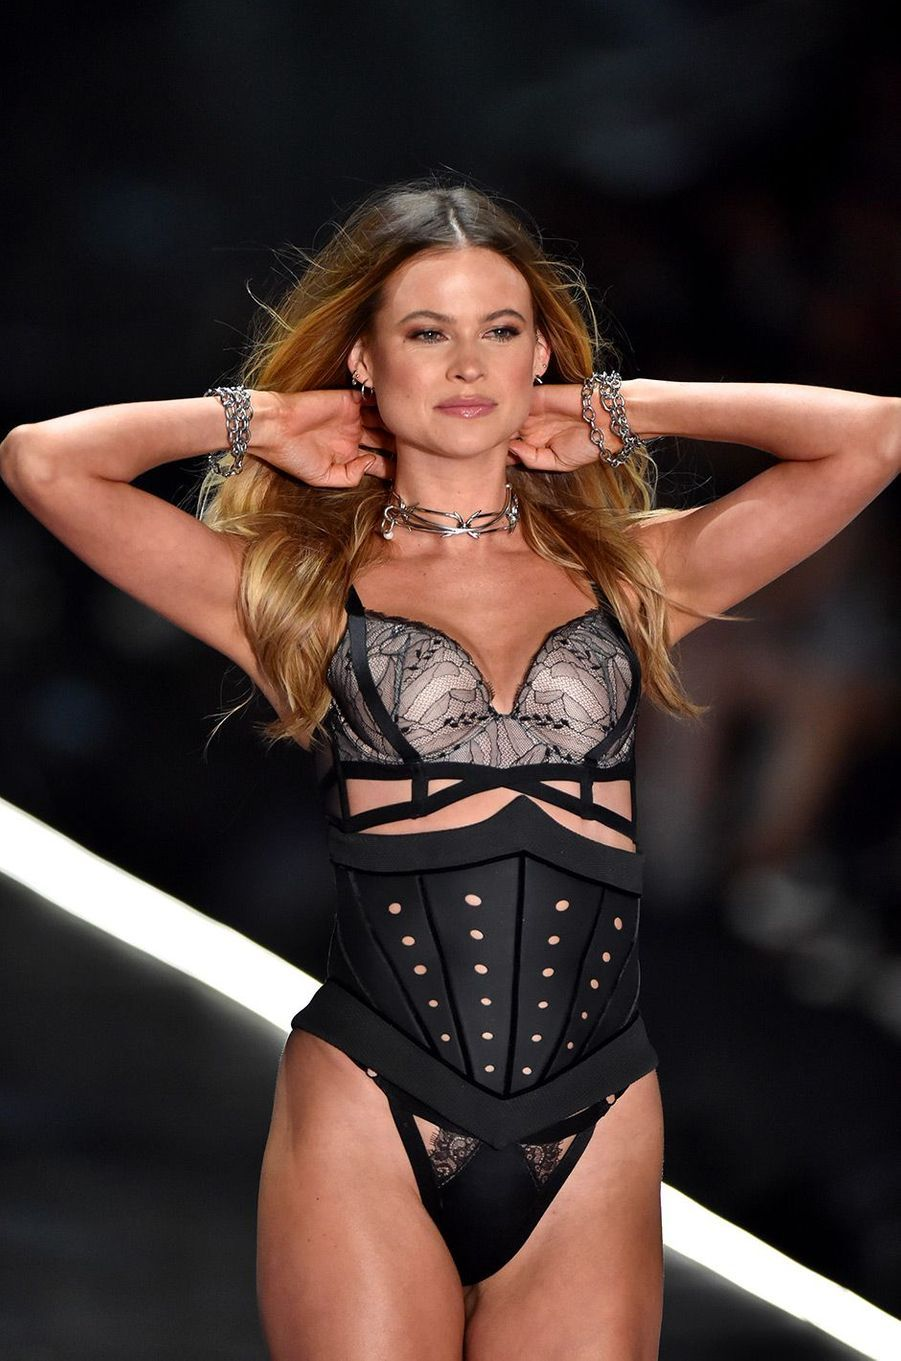 Behati Prinsloo au défilé Victoria's Secret 2018, à New York, jeudi 8 novembre